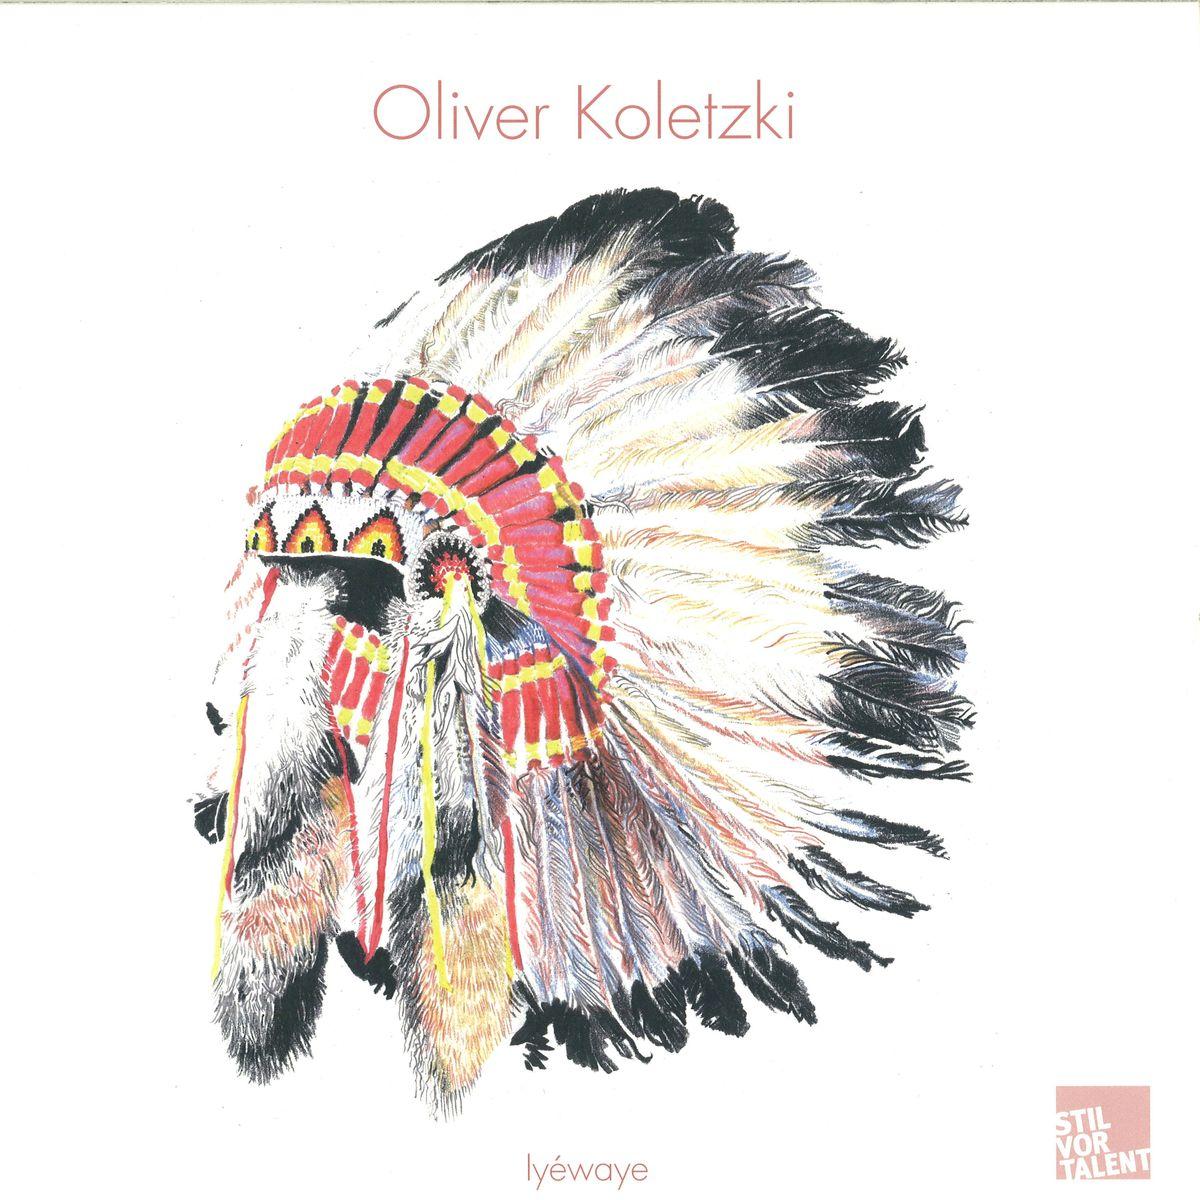 OliverKoletzki-Iyeway-StilVorTalent